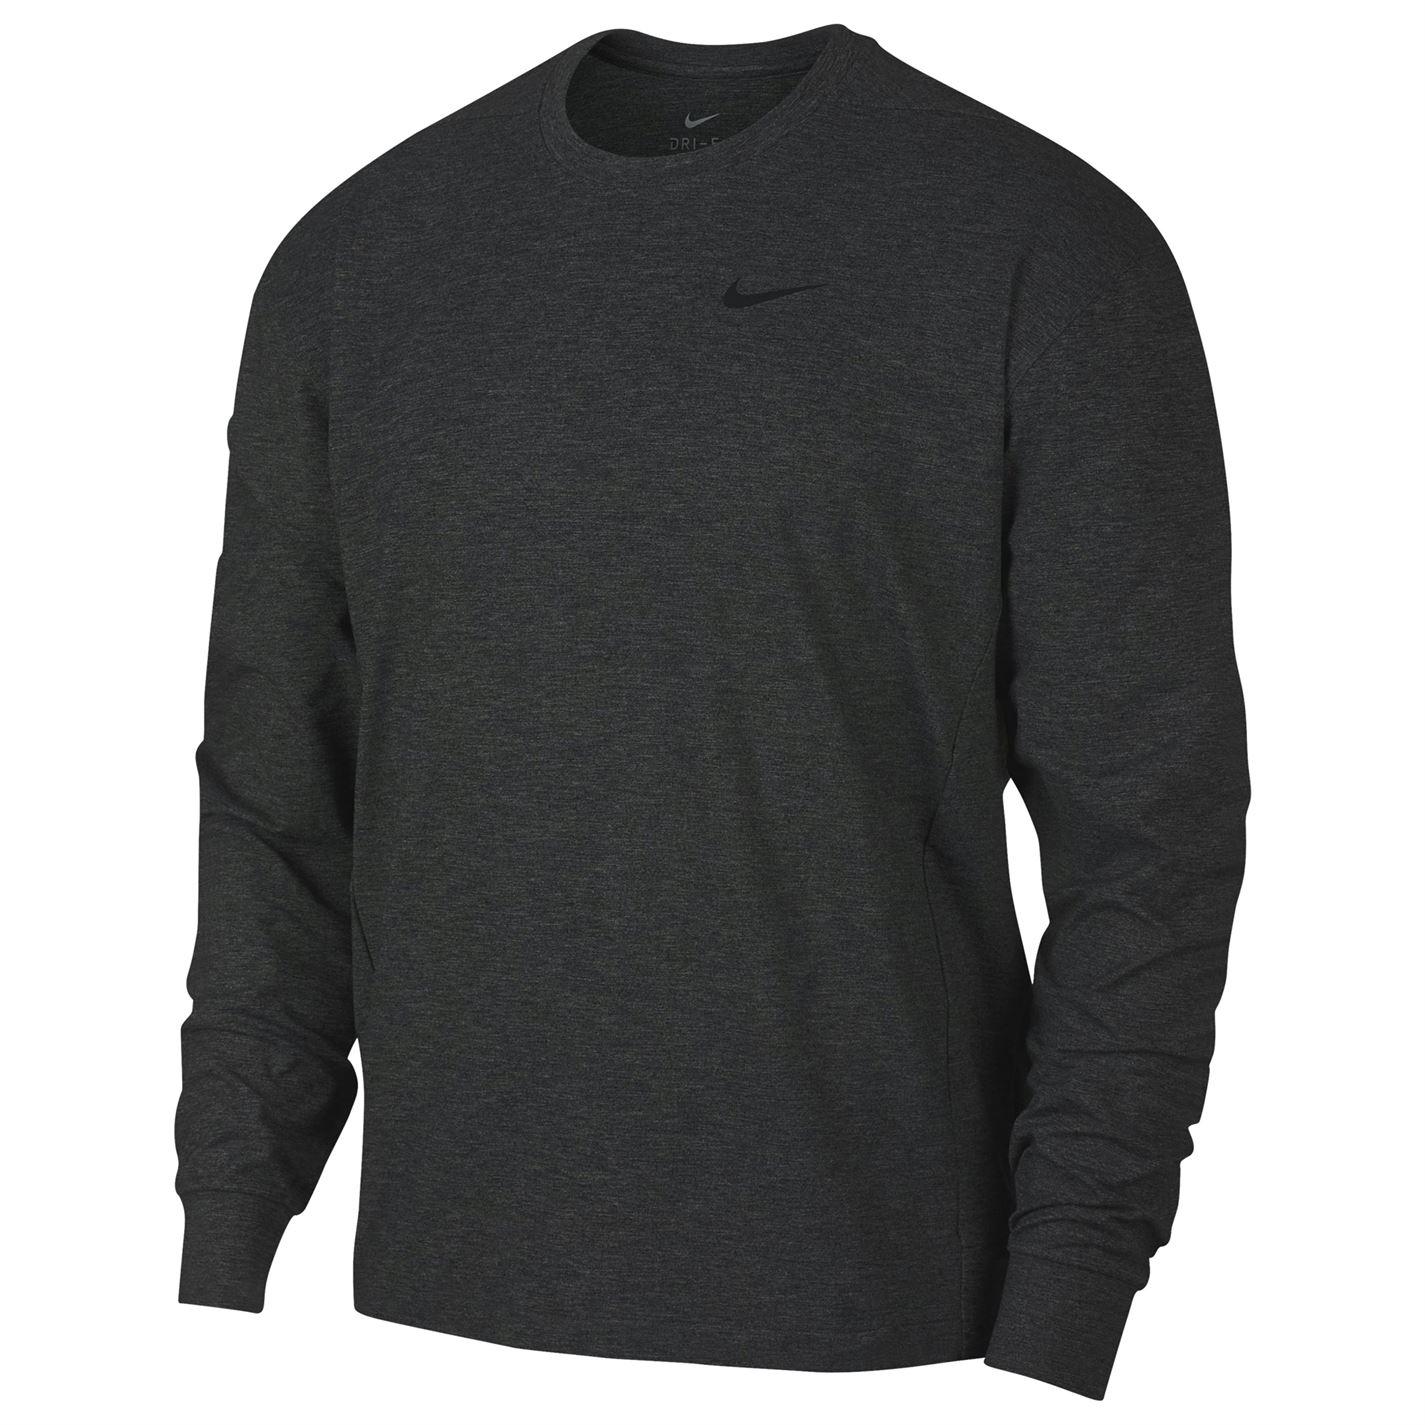 Triko Nike Hyper Dry Long Sleeve T Shirt pánské